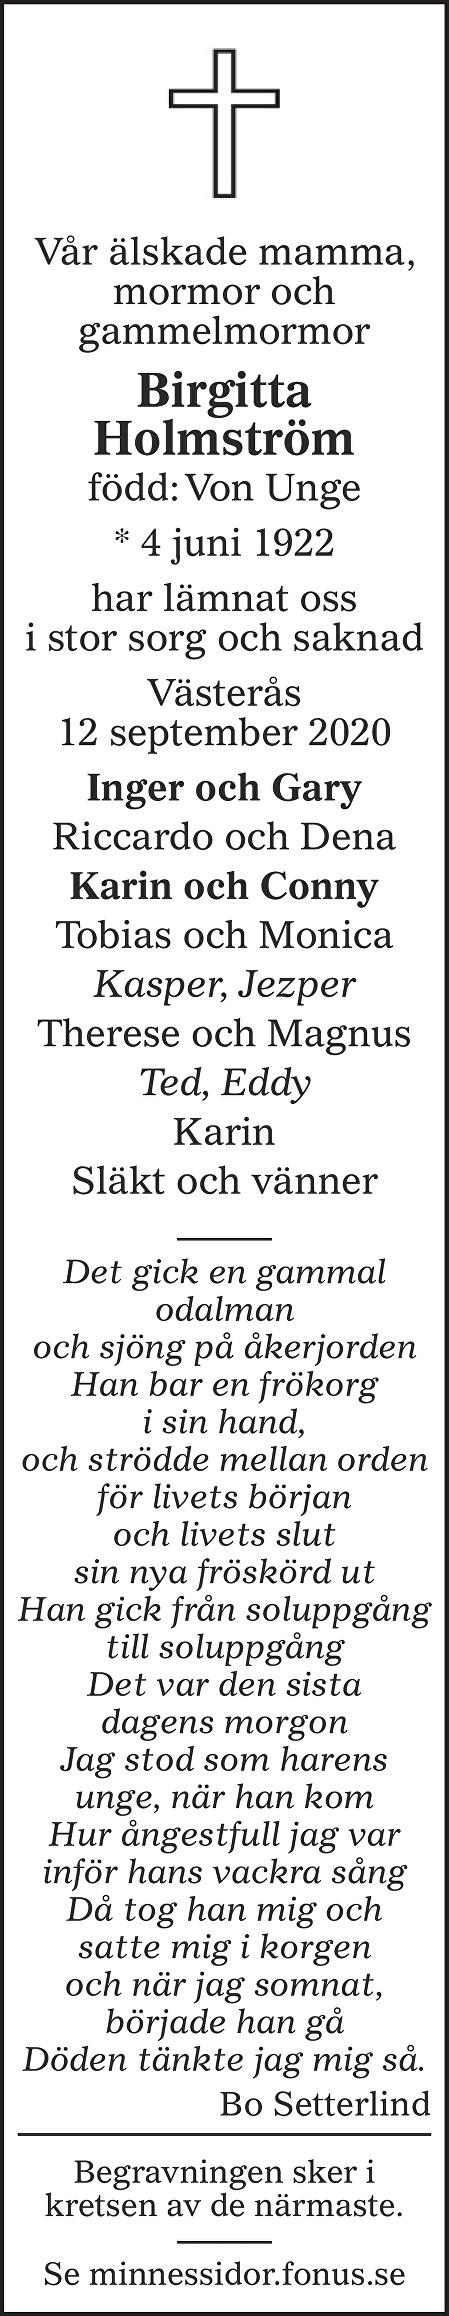 Birgitta Holmström Death notice